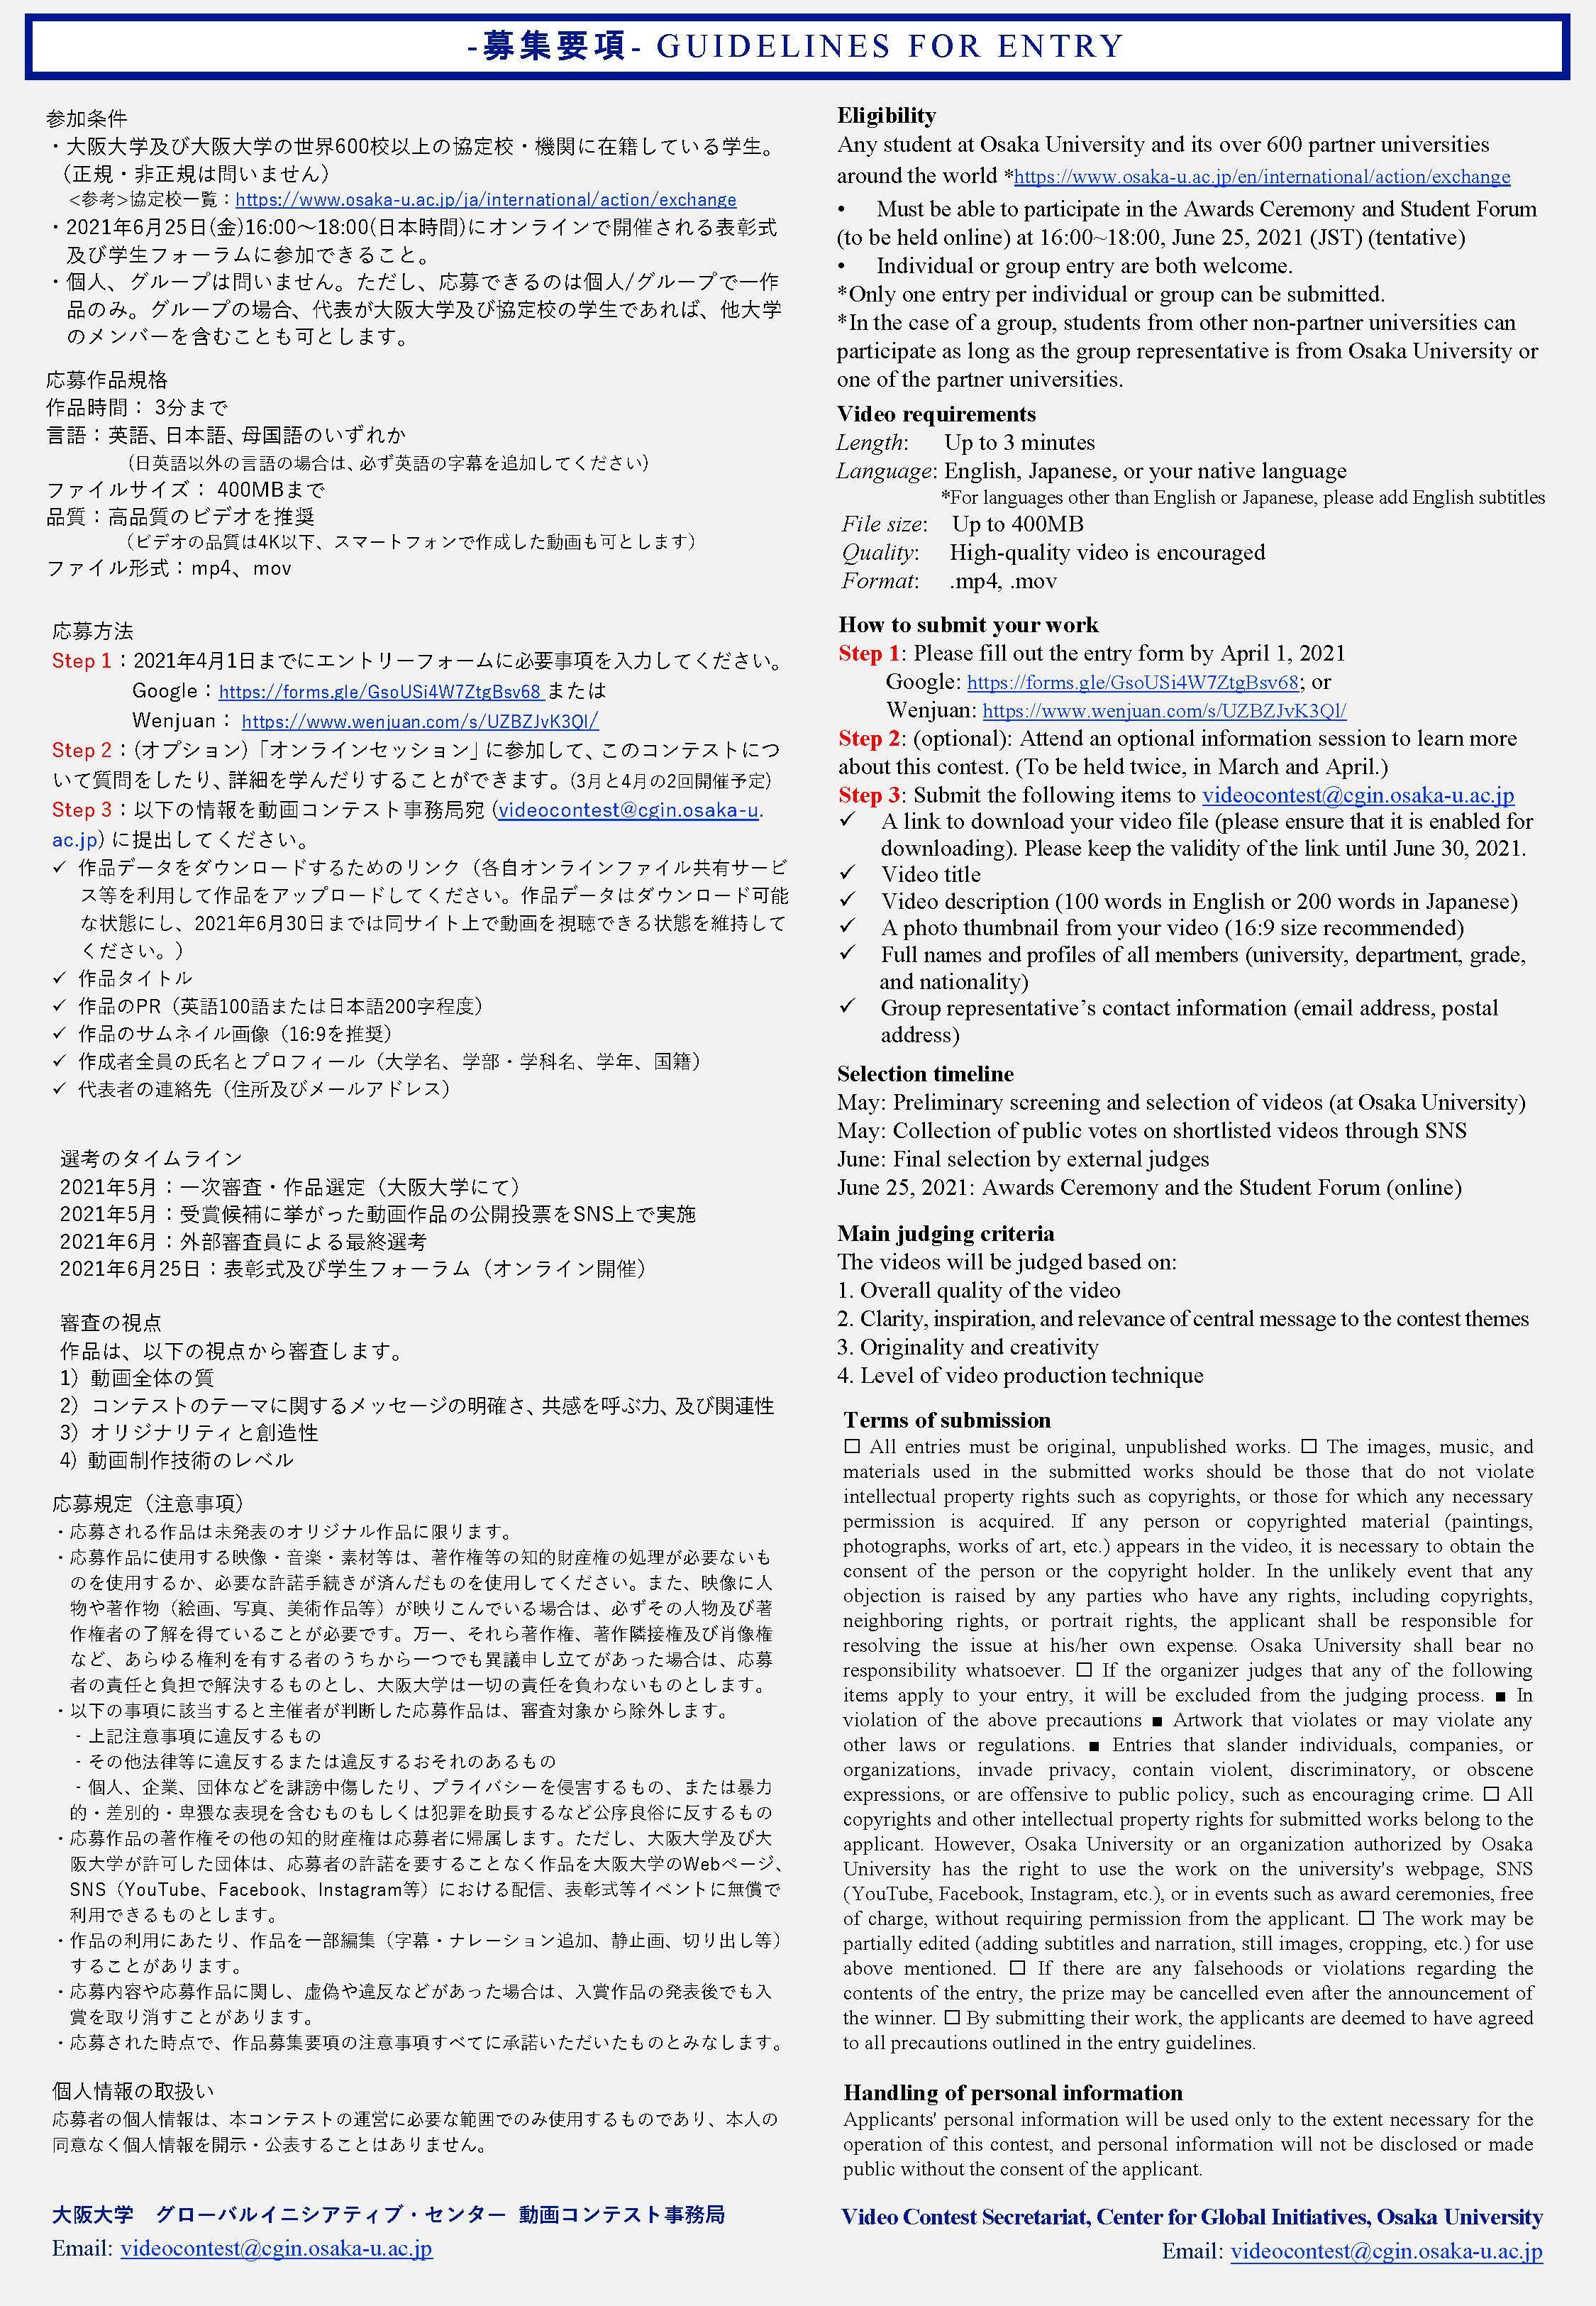 210312_OsakaUniversityStudent VideoContestFlyer_p02.jpg